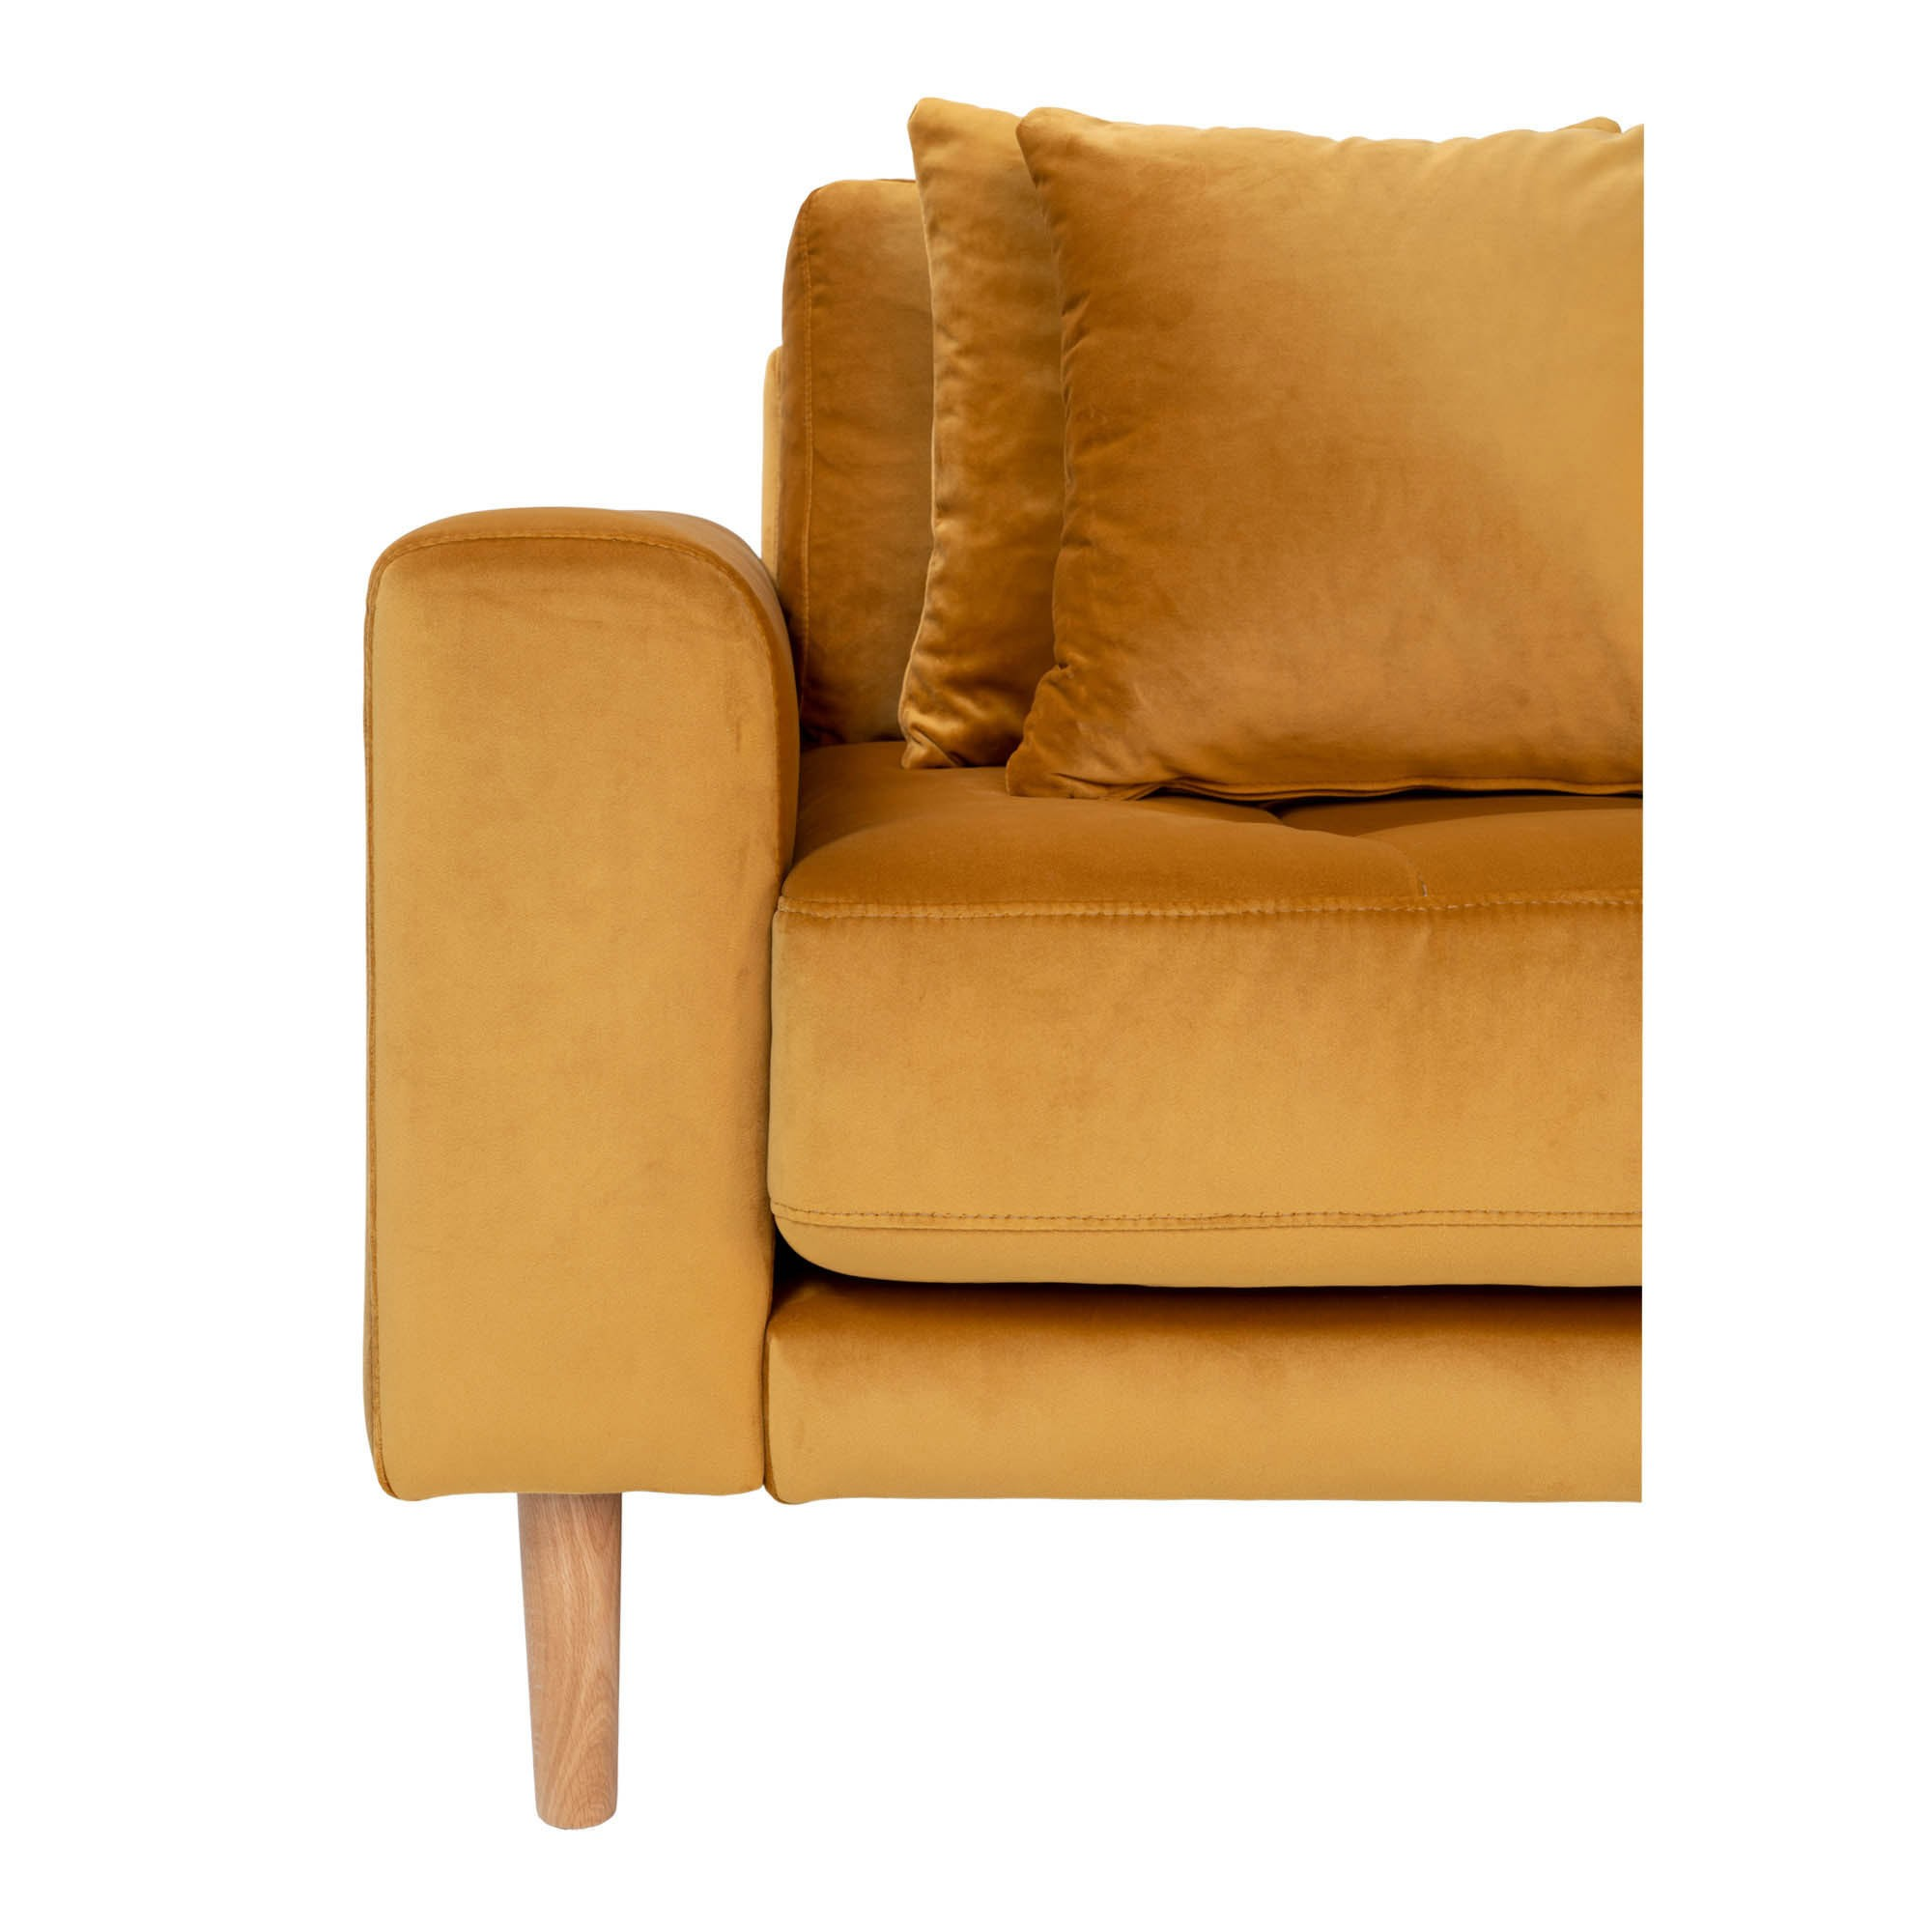 Lido Lounge Sofa i sennepsgul velour højrevendt